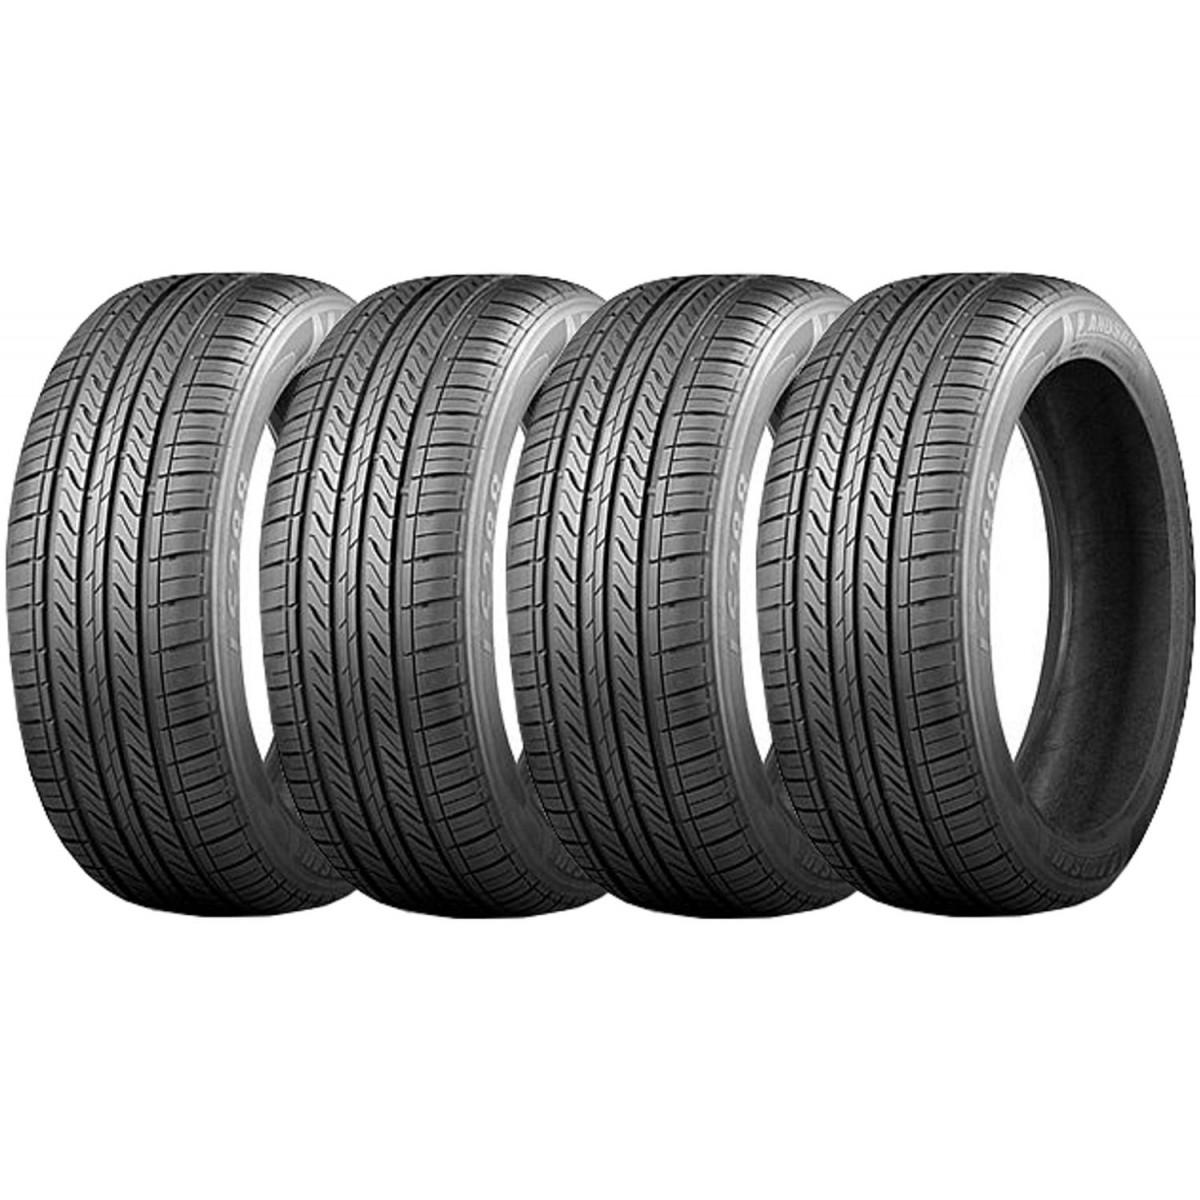 combo 4 pneus volkswagen polo 205 45r16 87w ls288 landsail martinense pneus. Black Bedroom Furniture Sets. Home Design Ideas